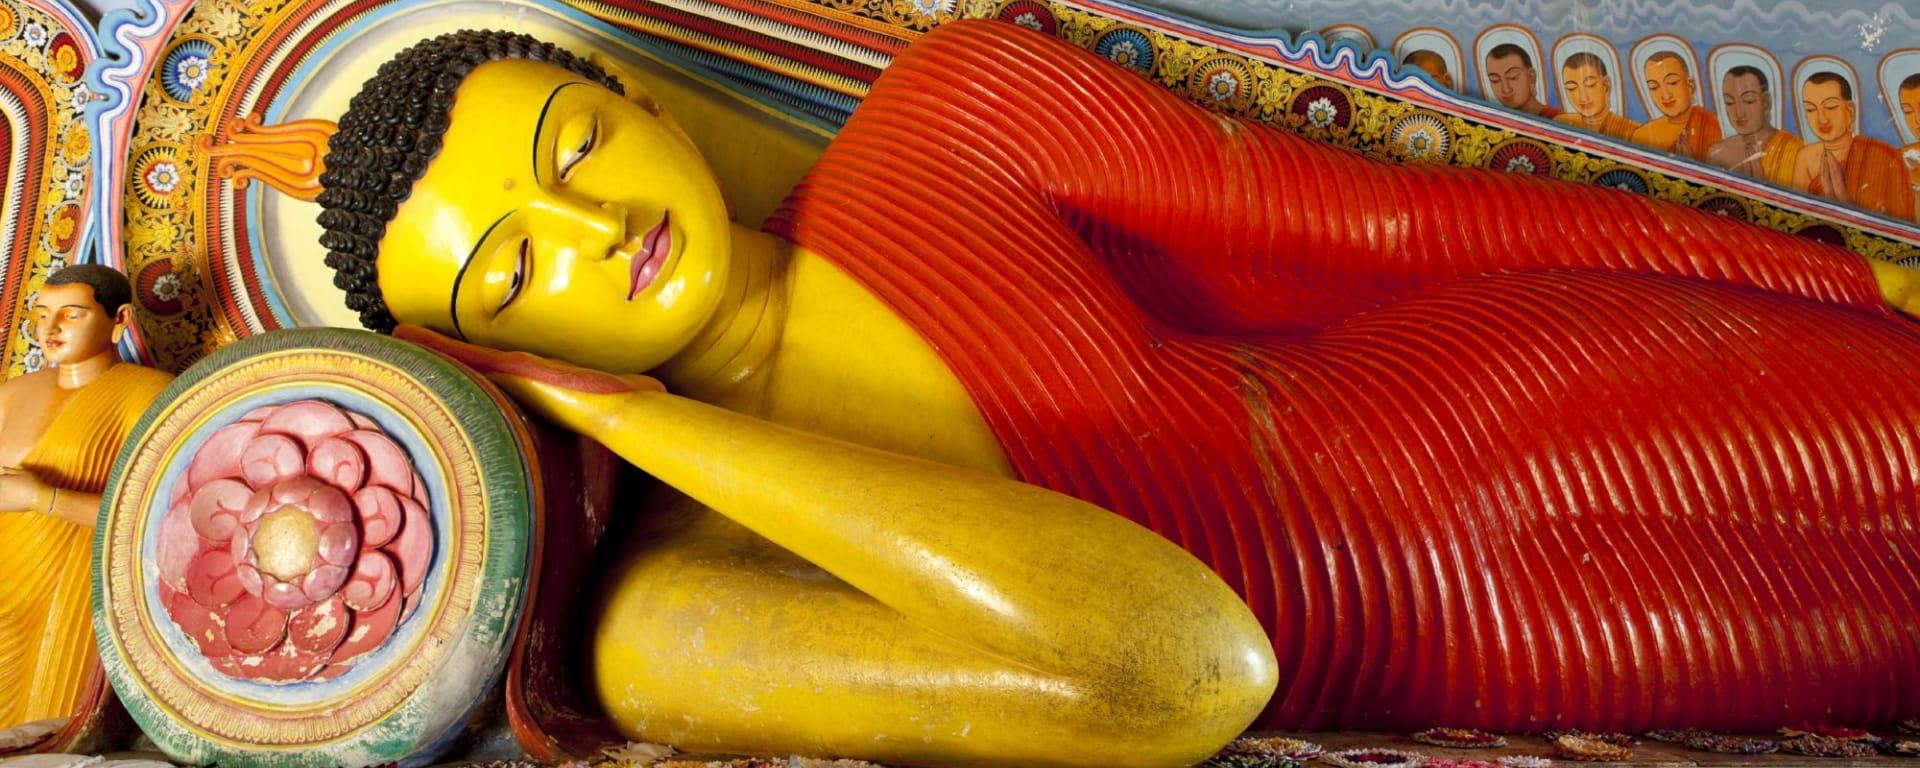 Voyages en Sri Lanka | Vacances en Asie par tourasia: Anuradhapura Isurumuniya